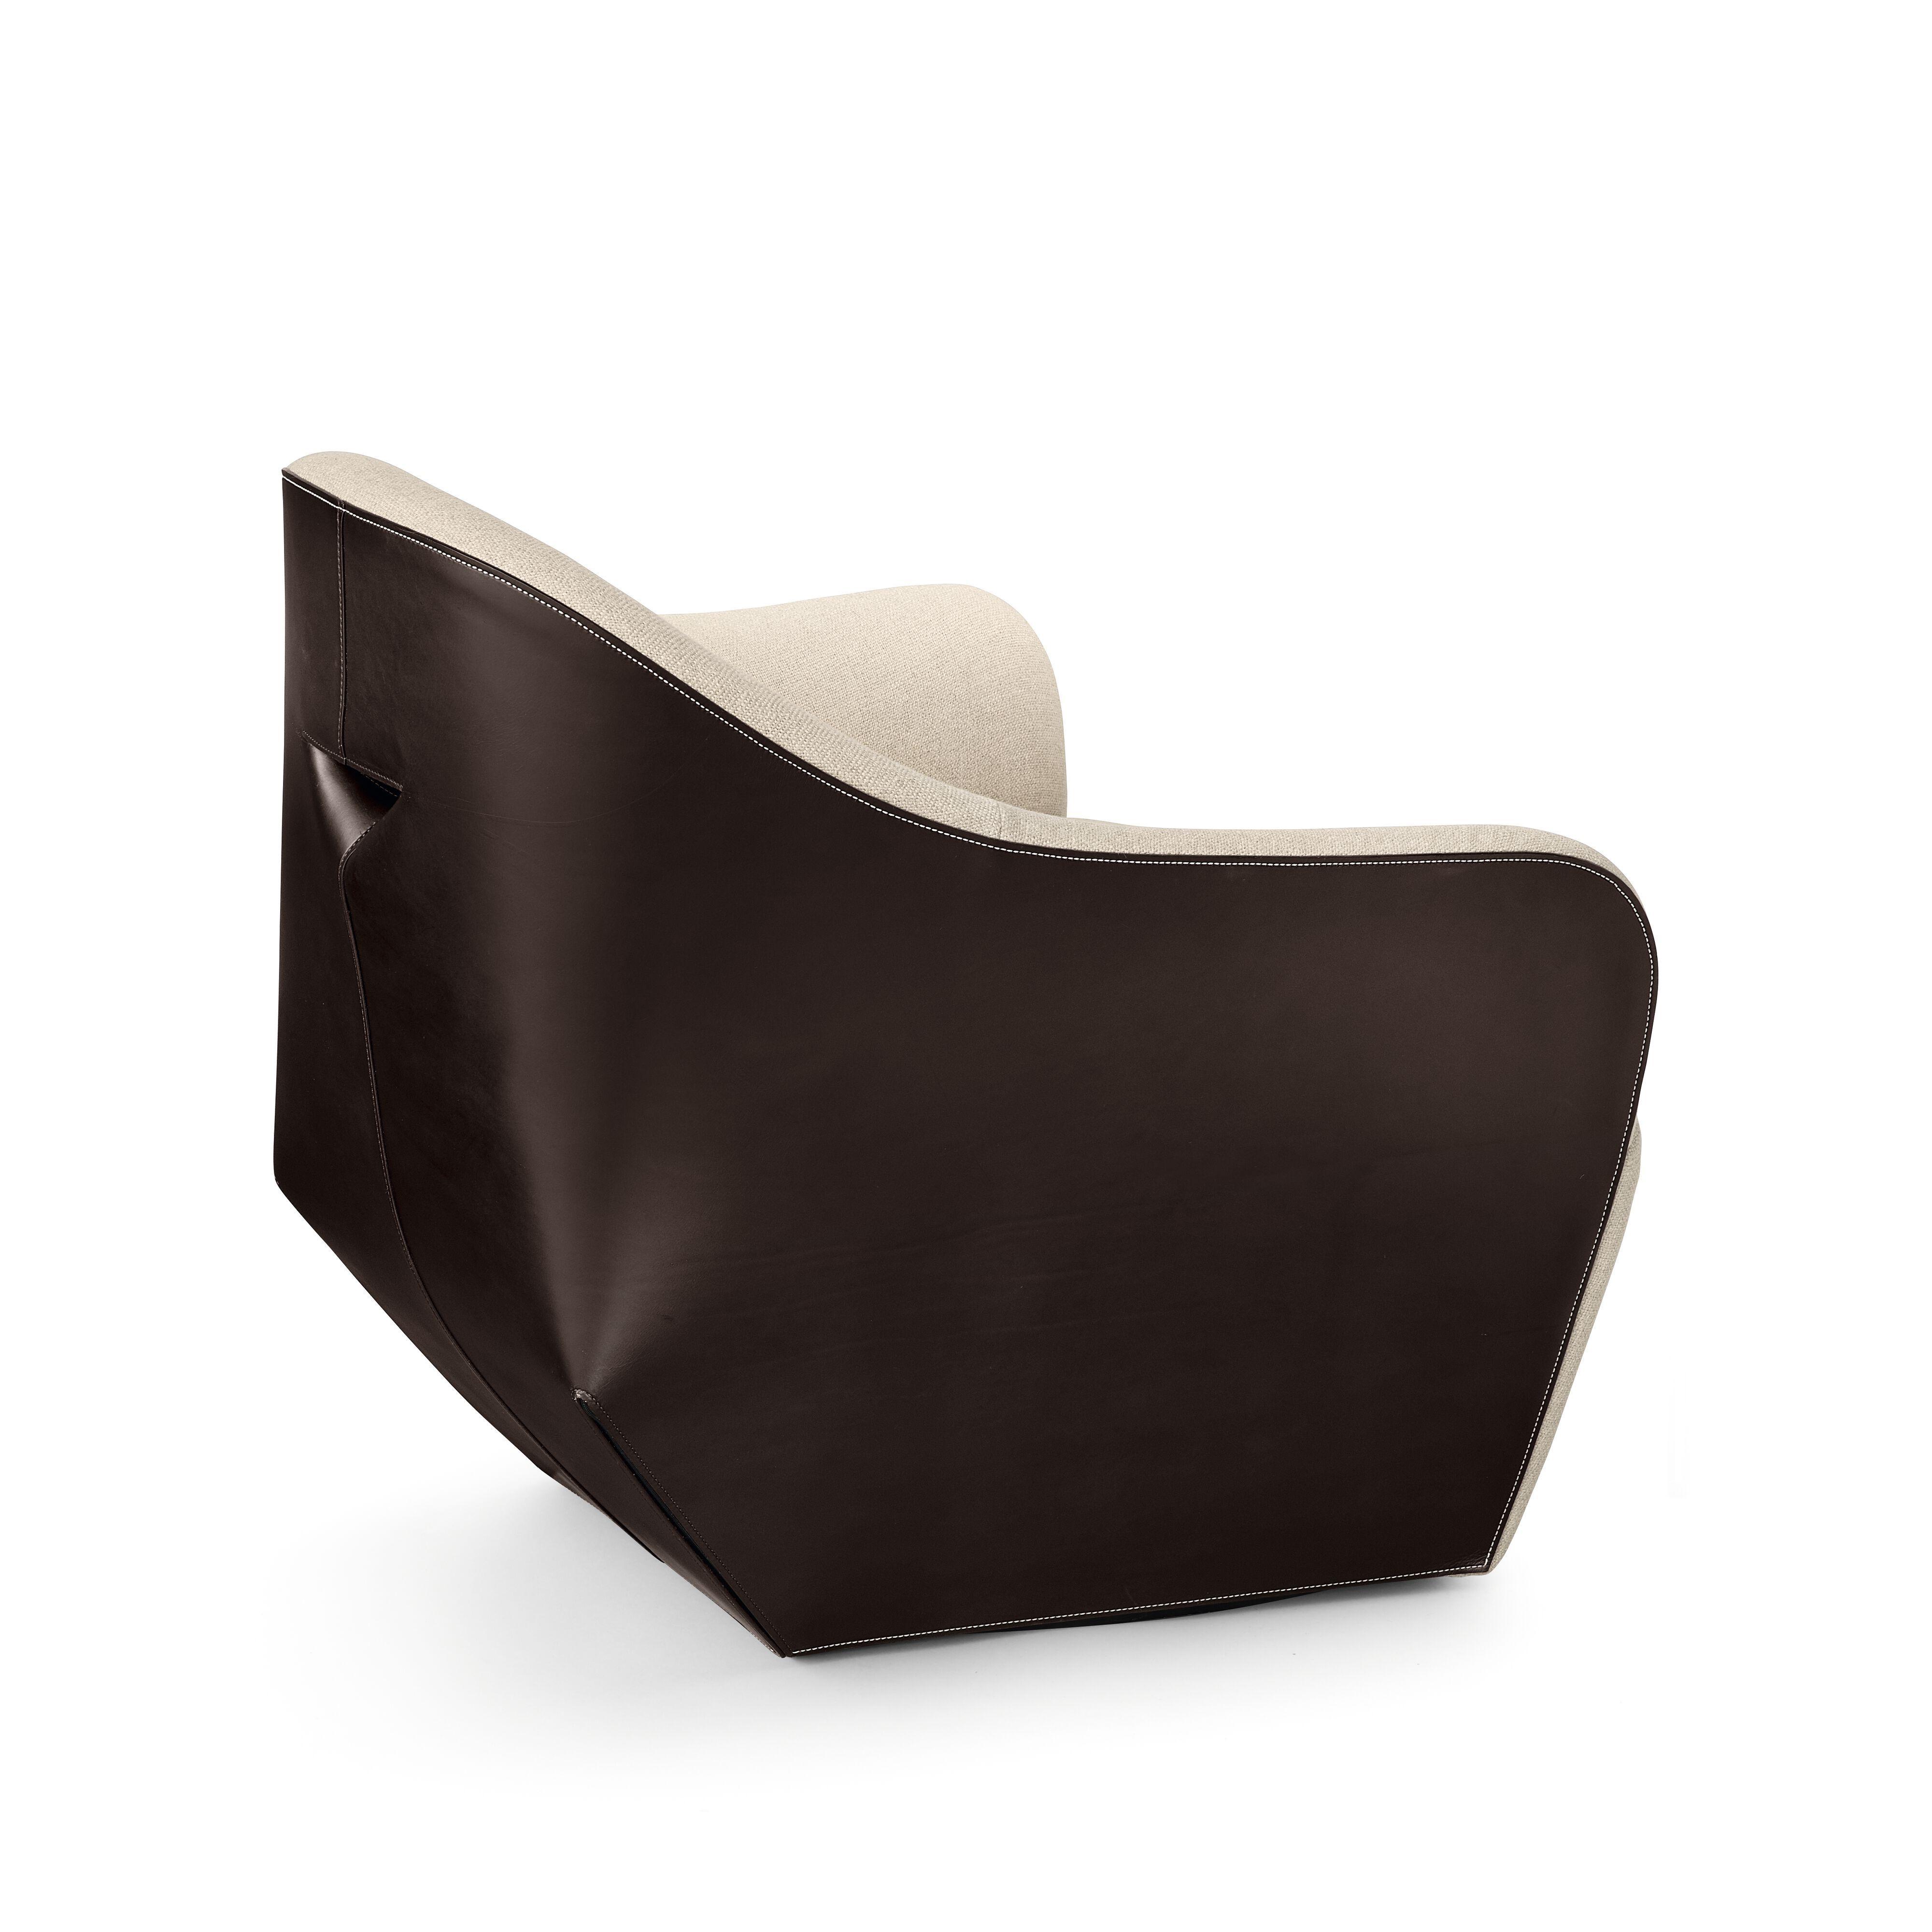 03-WK-Isanka-Chair-0004-H.tif